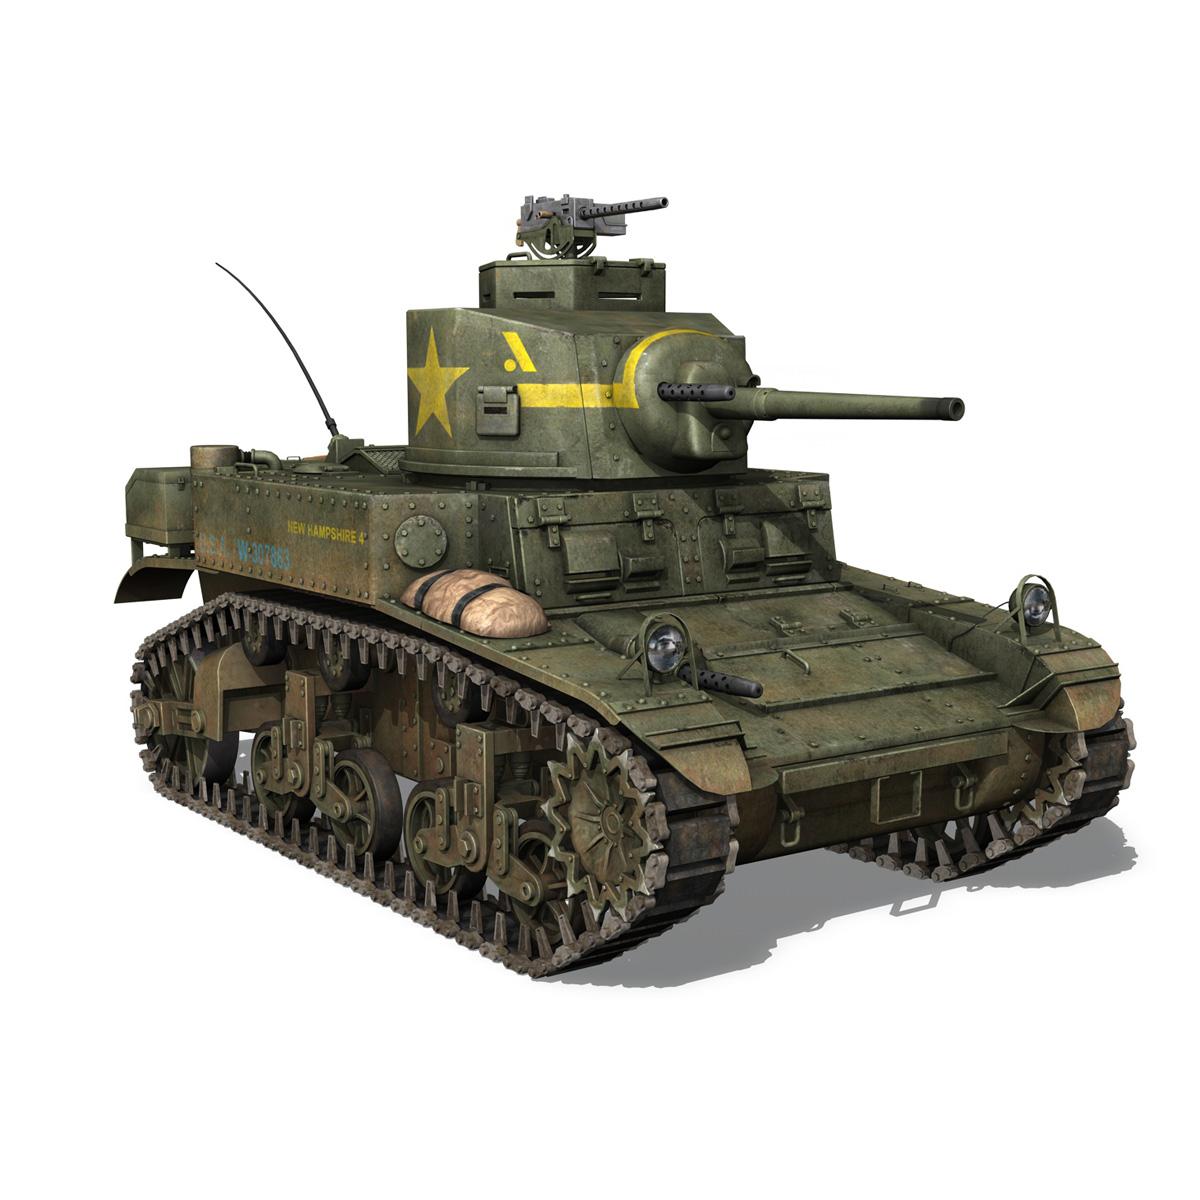 m3 light tank stuart – new hampshire 4 3d model 3ds c4d fbx lwo lw lws obj 266380